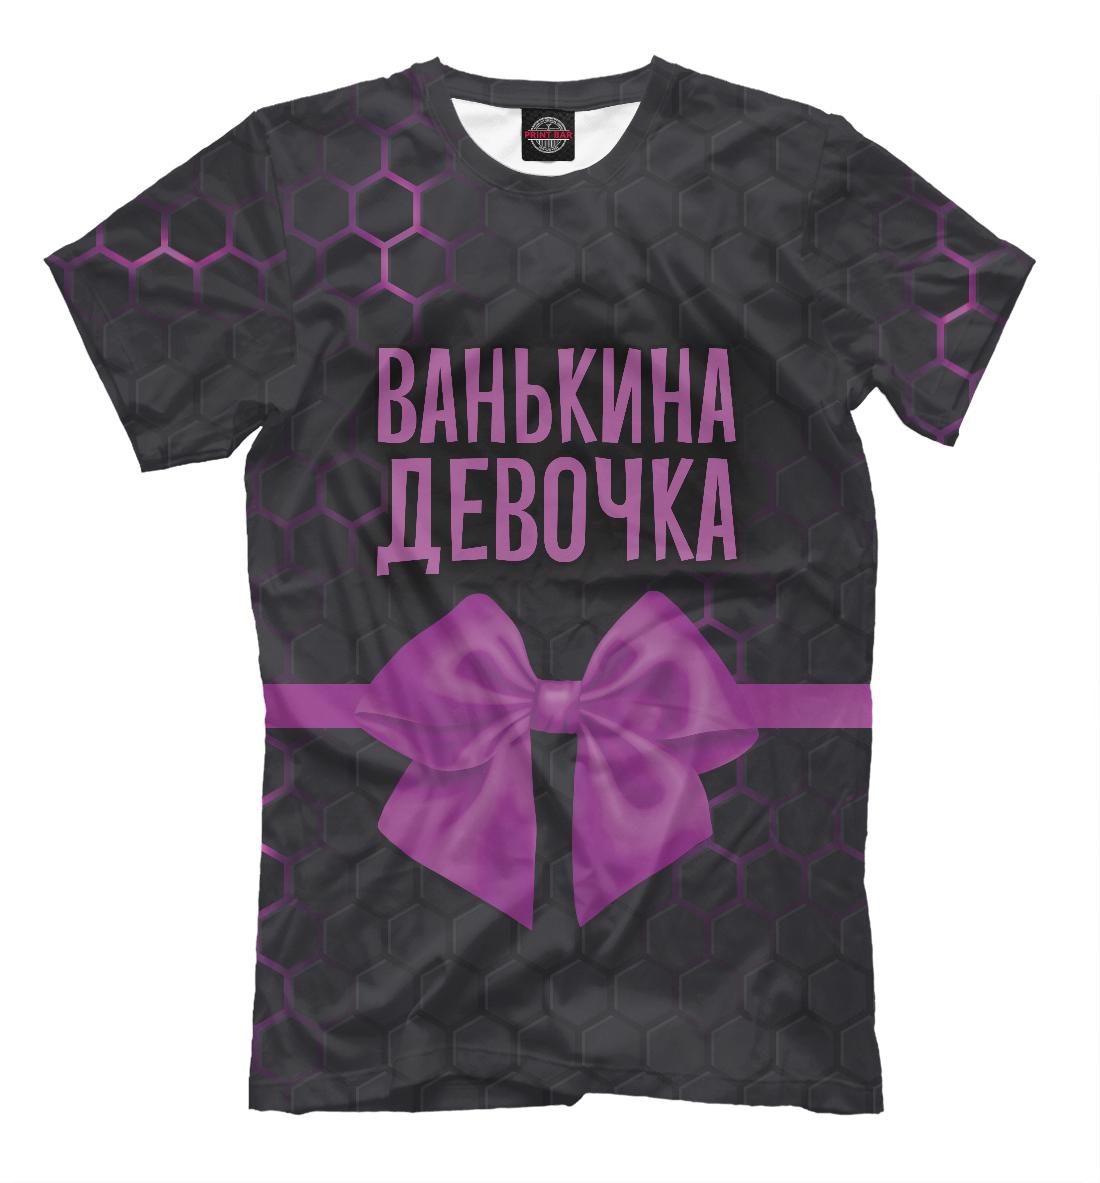 Футболка Ванькина девочка (351264)